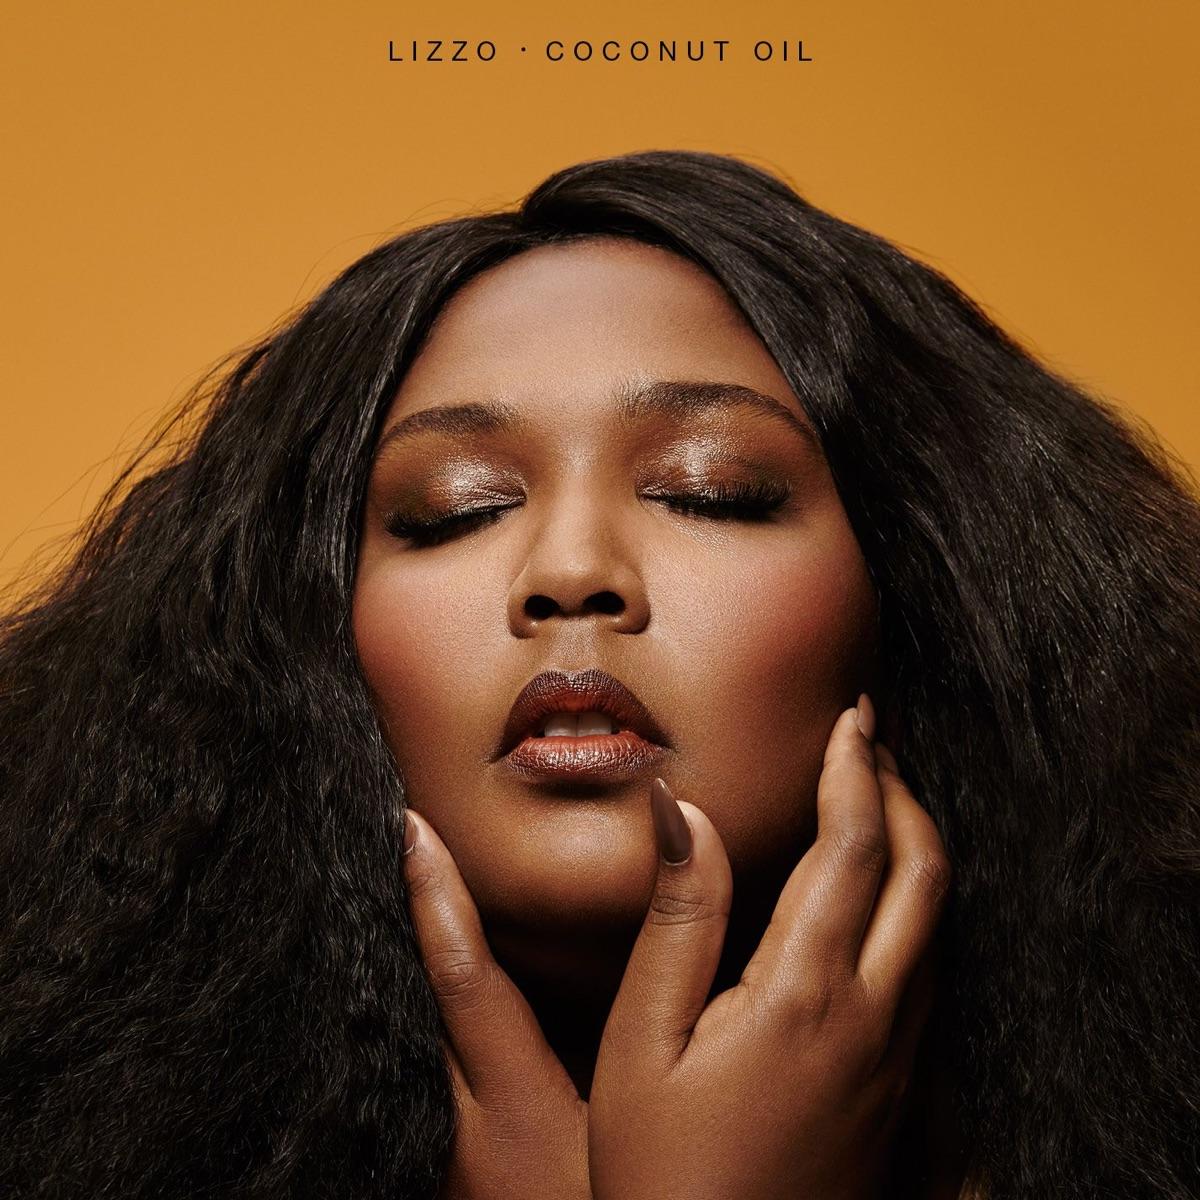 Coconut Oil - EP Lizzo CD cover